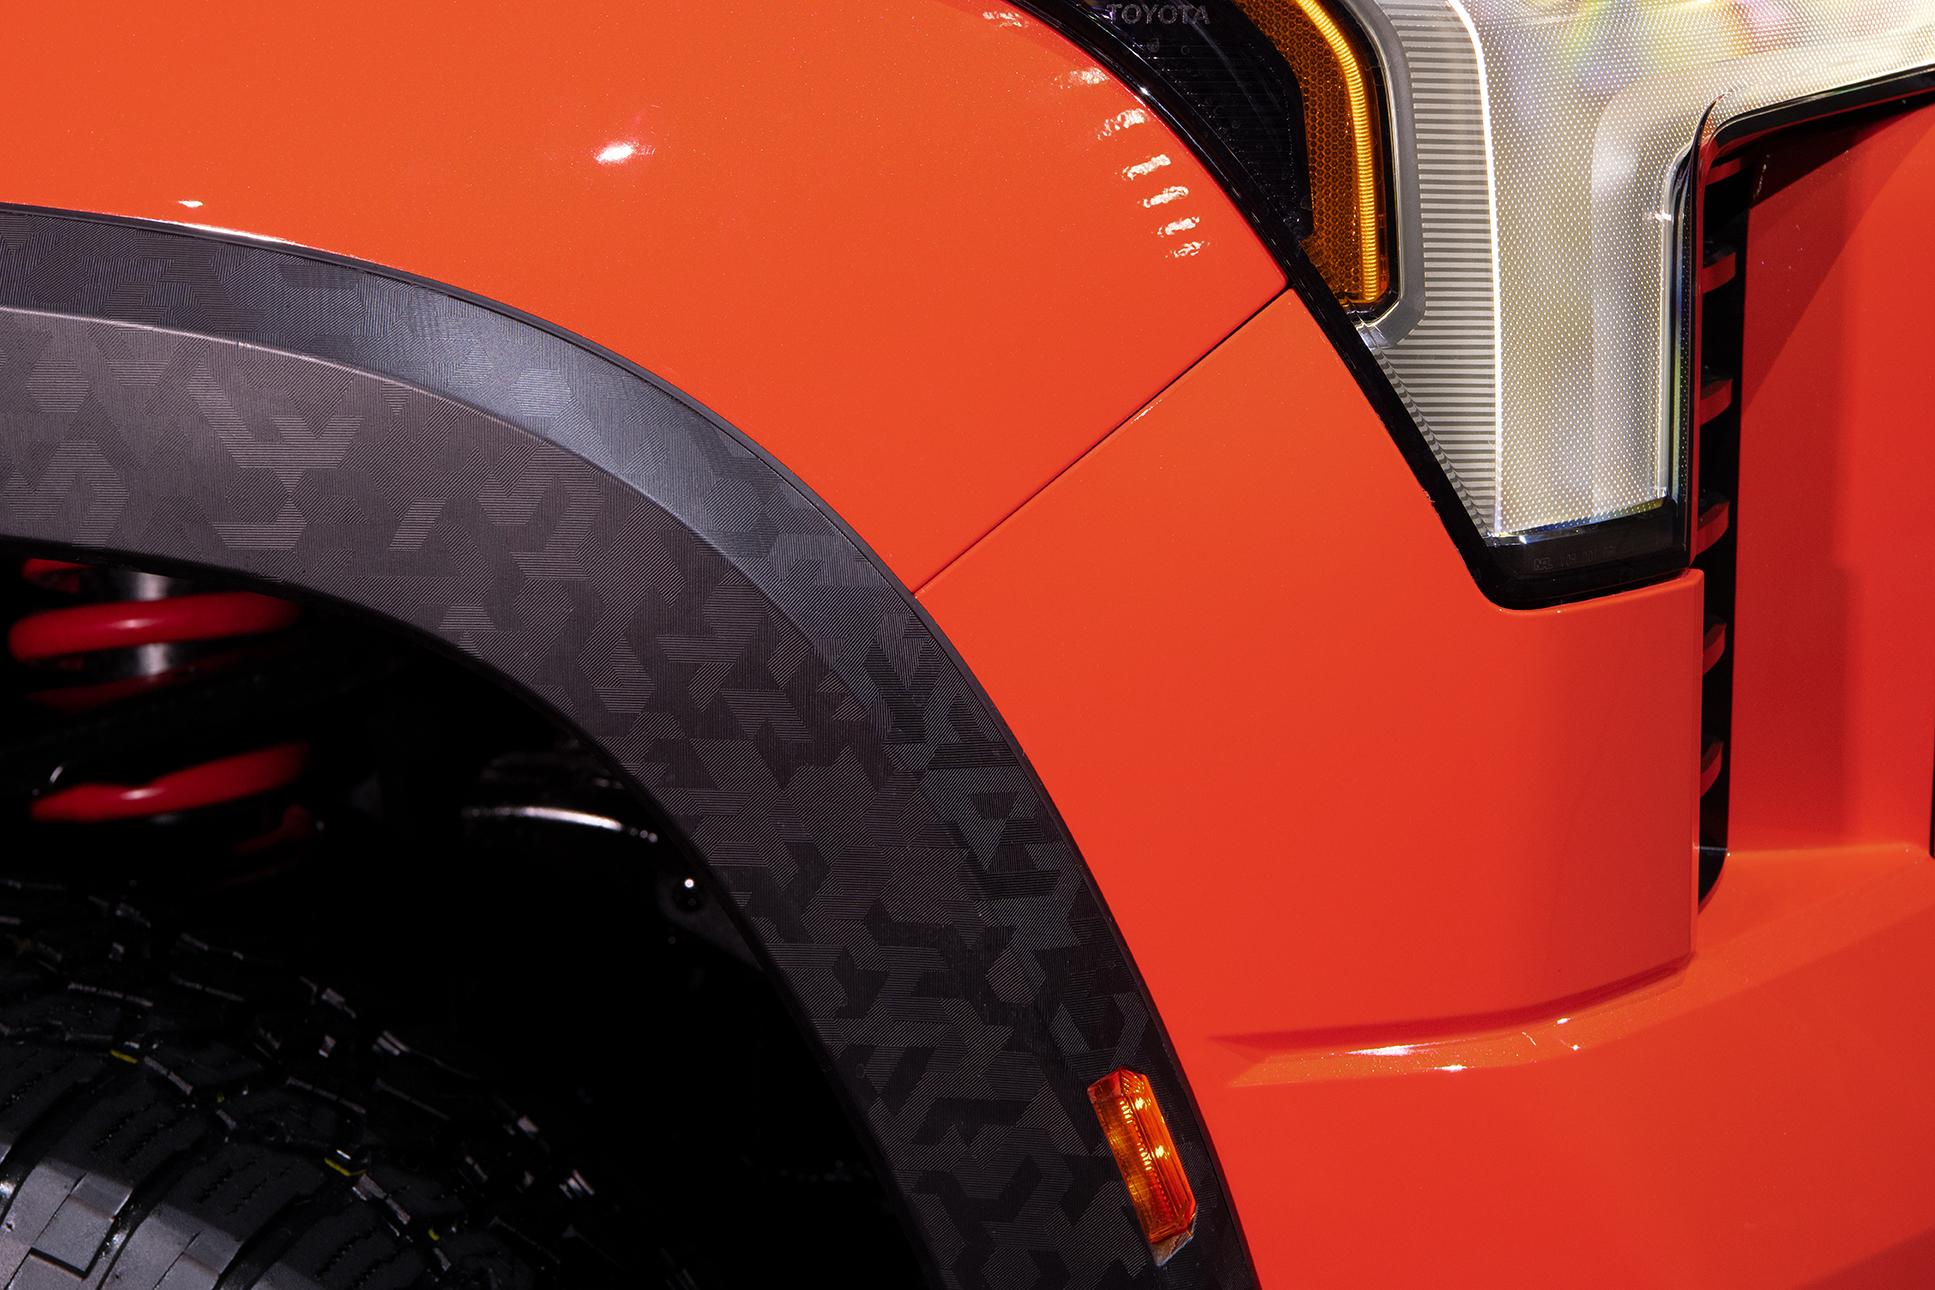 front fender of 2022 Toyota Tundra TRD Pro in Solar Octane orange